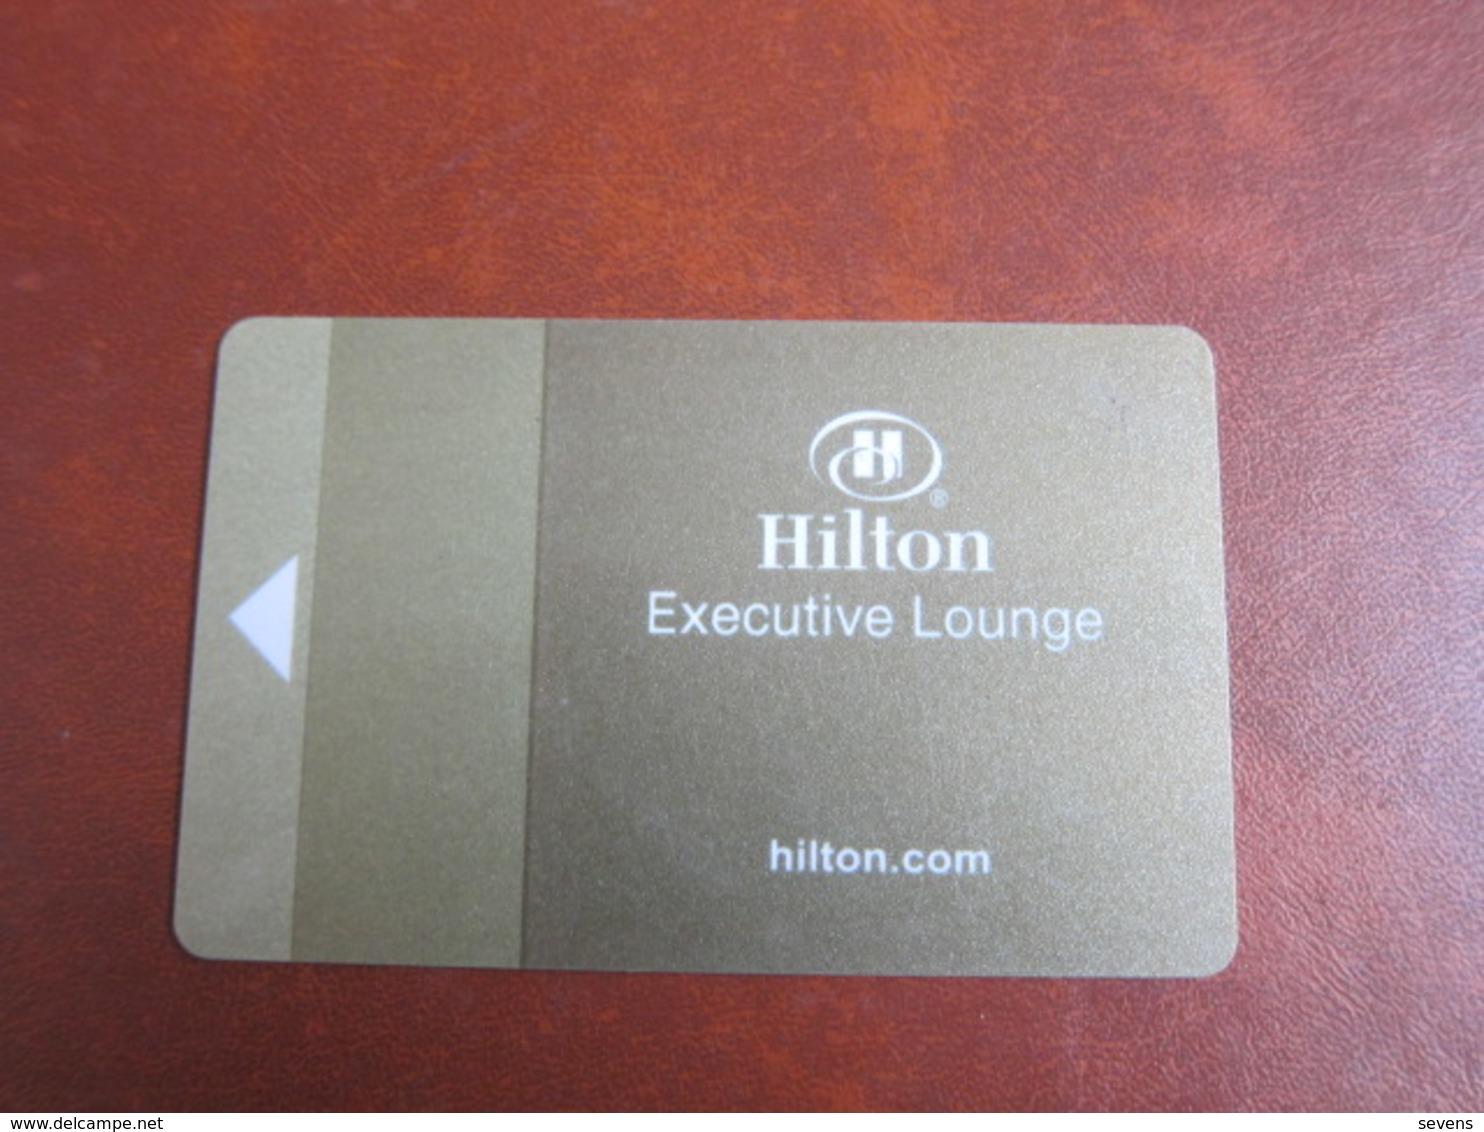 Hilton Executive Lounge - Cartas De Hotels